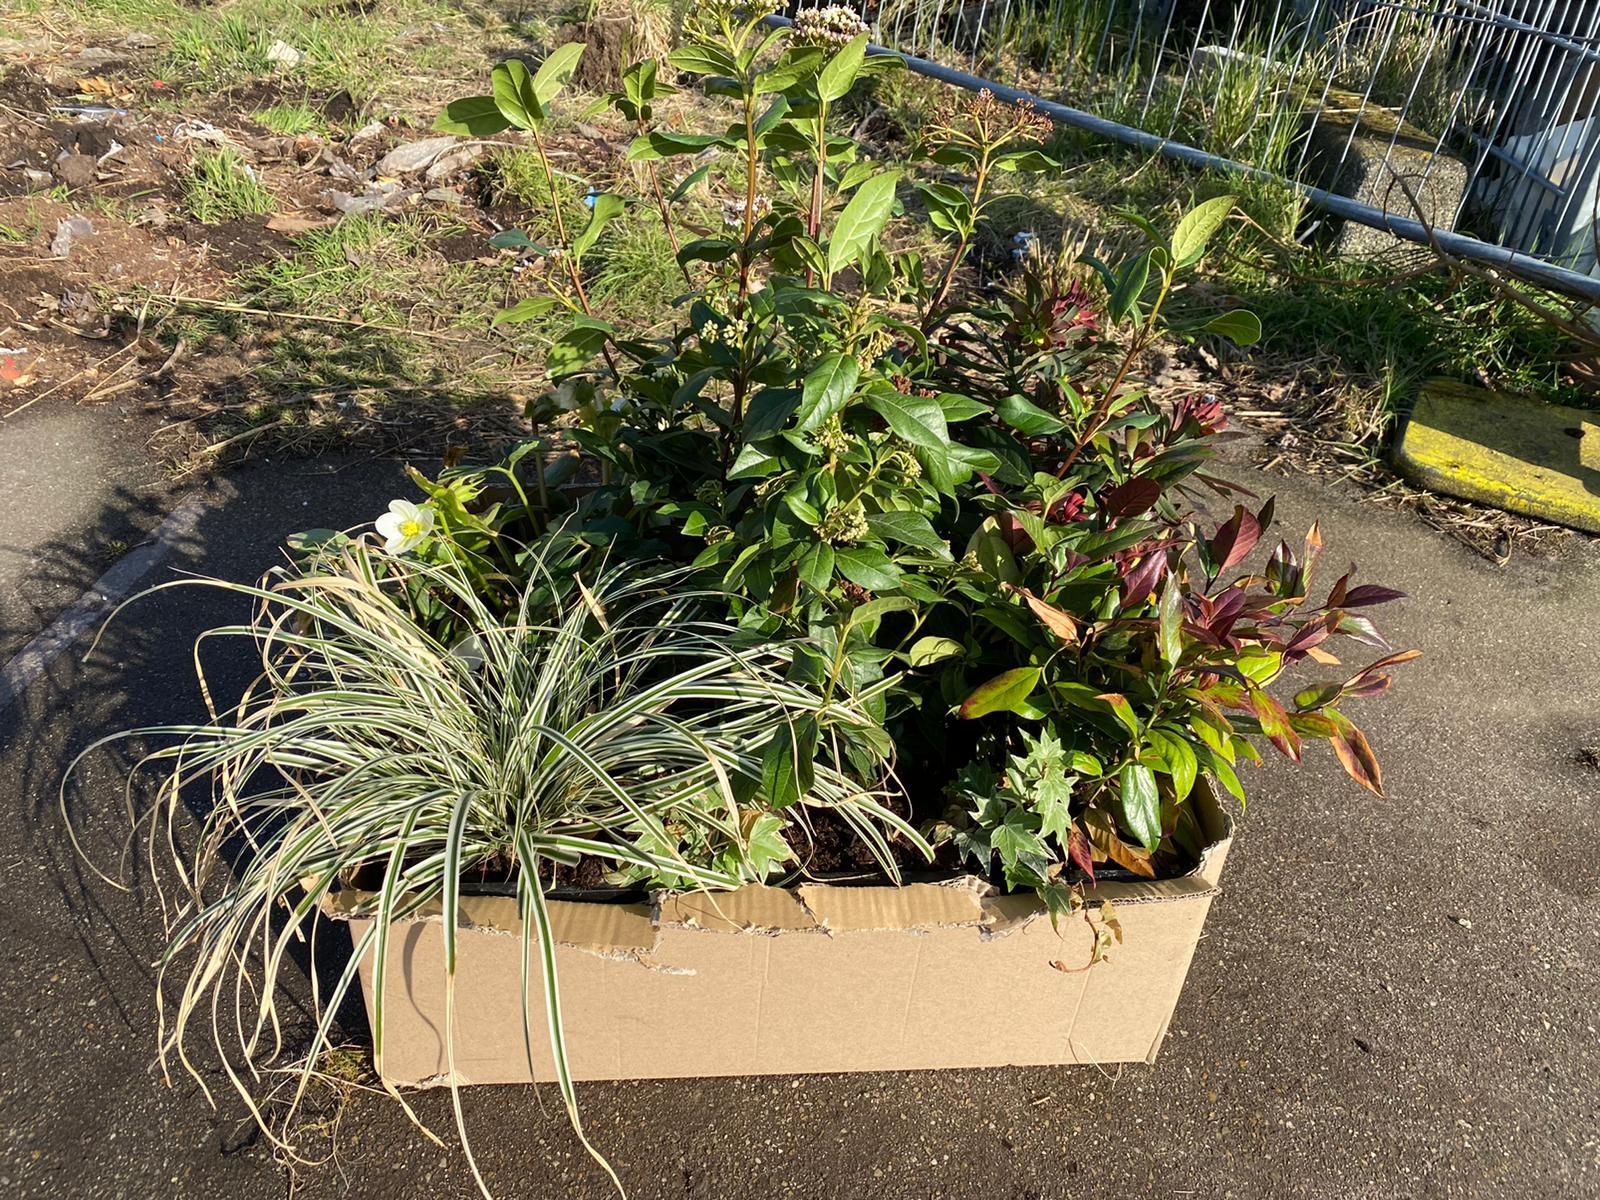 plantenpakket Tegels eruit, groen erin!